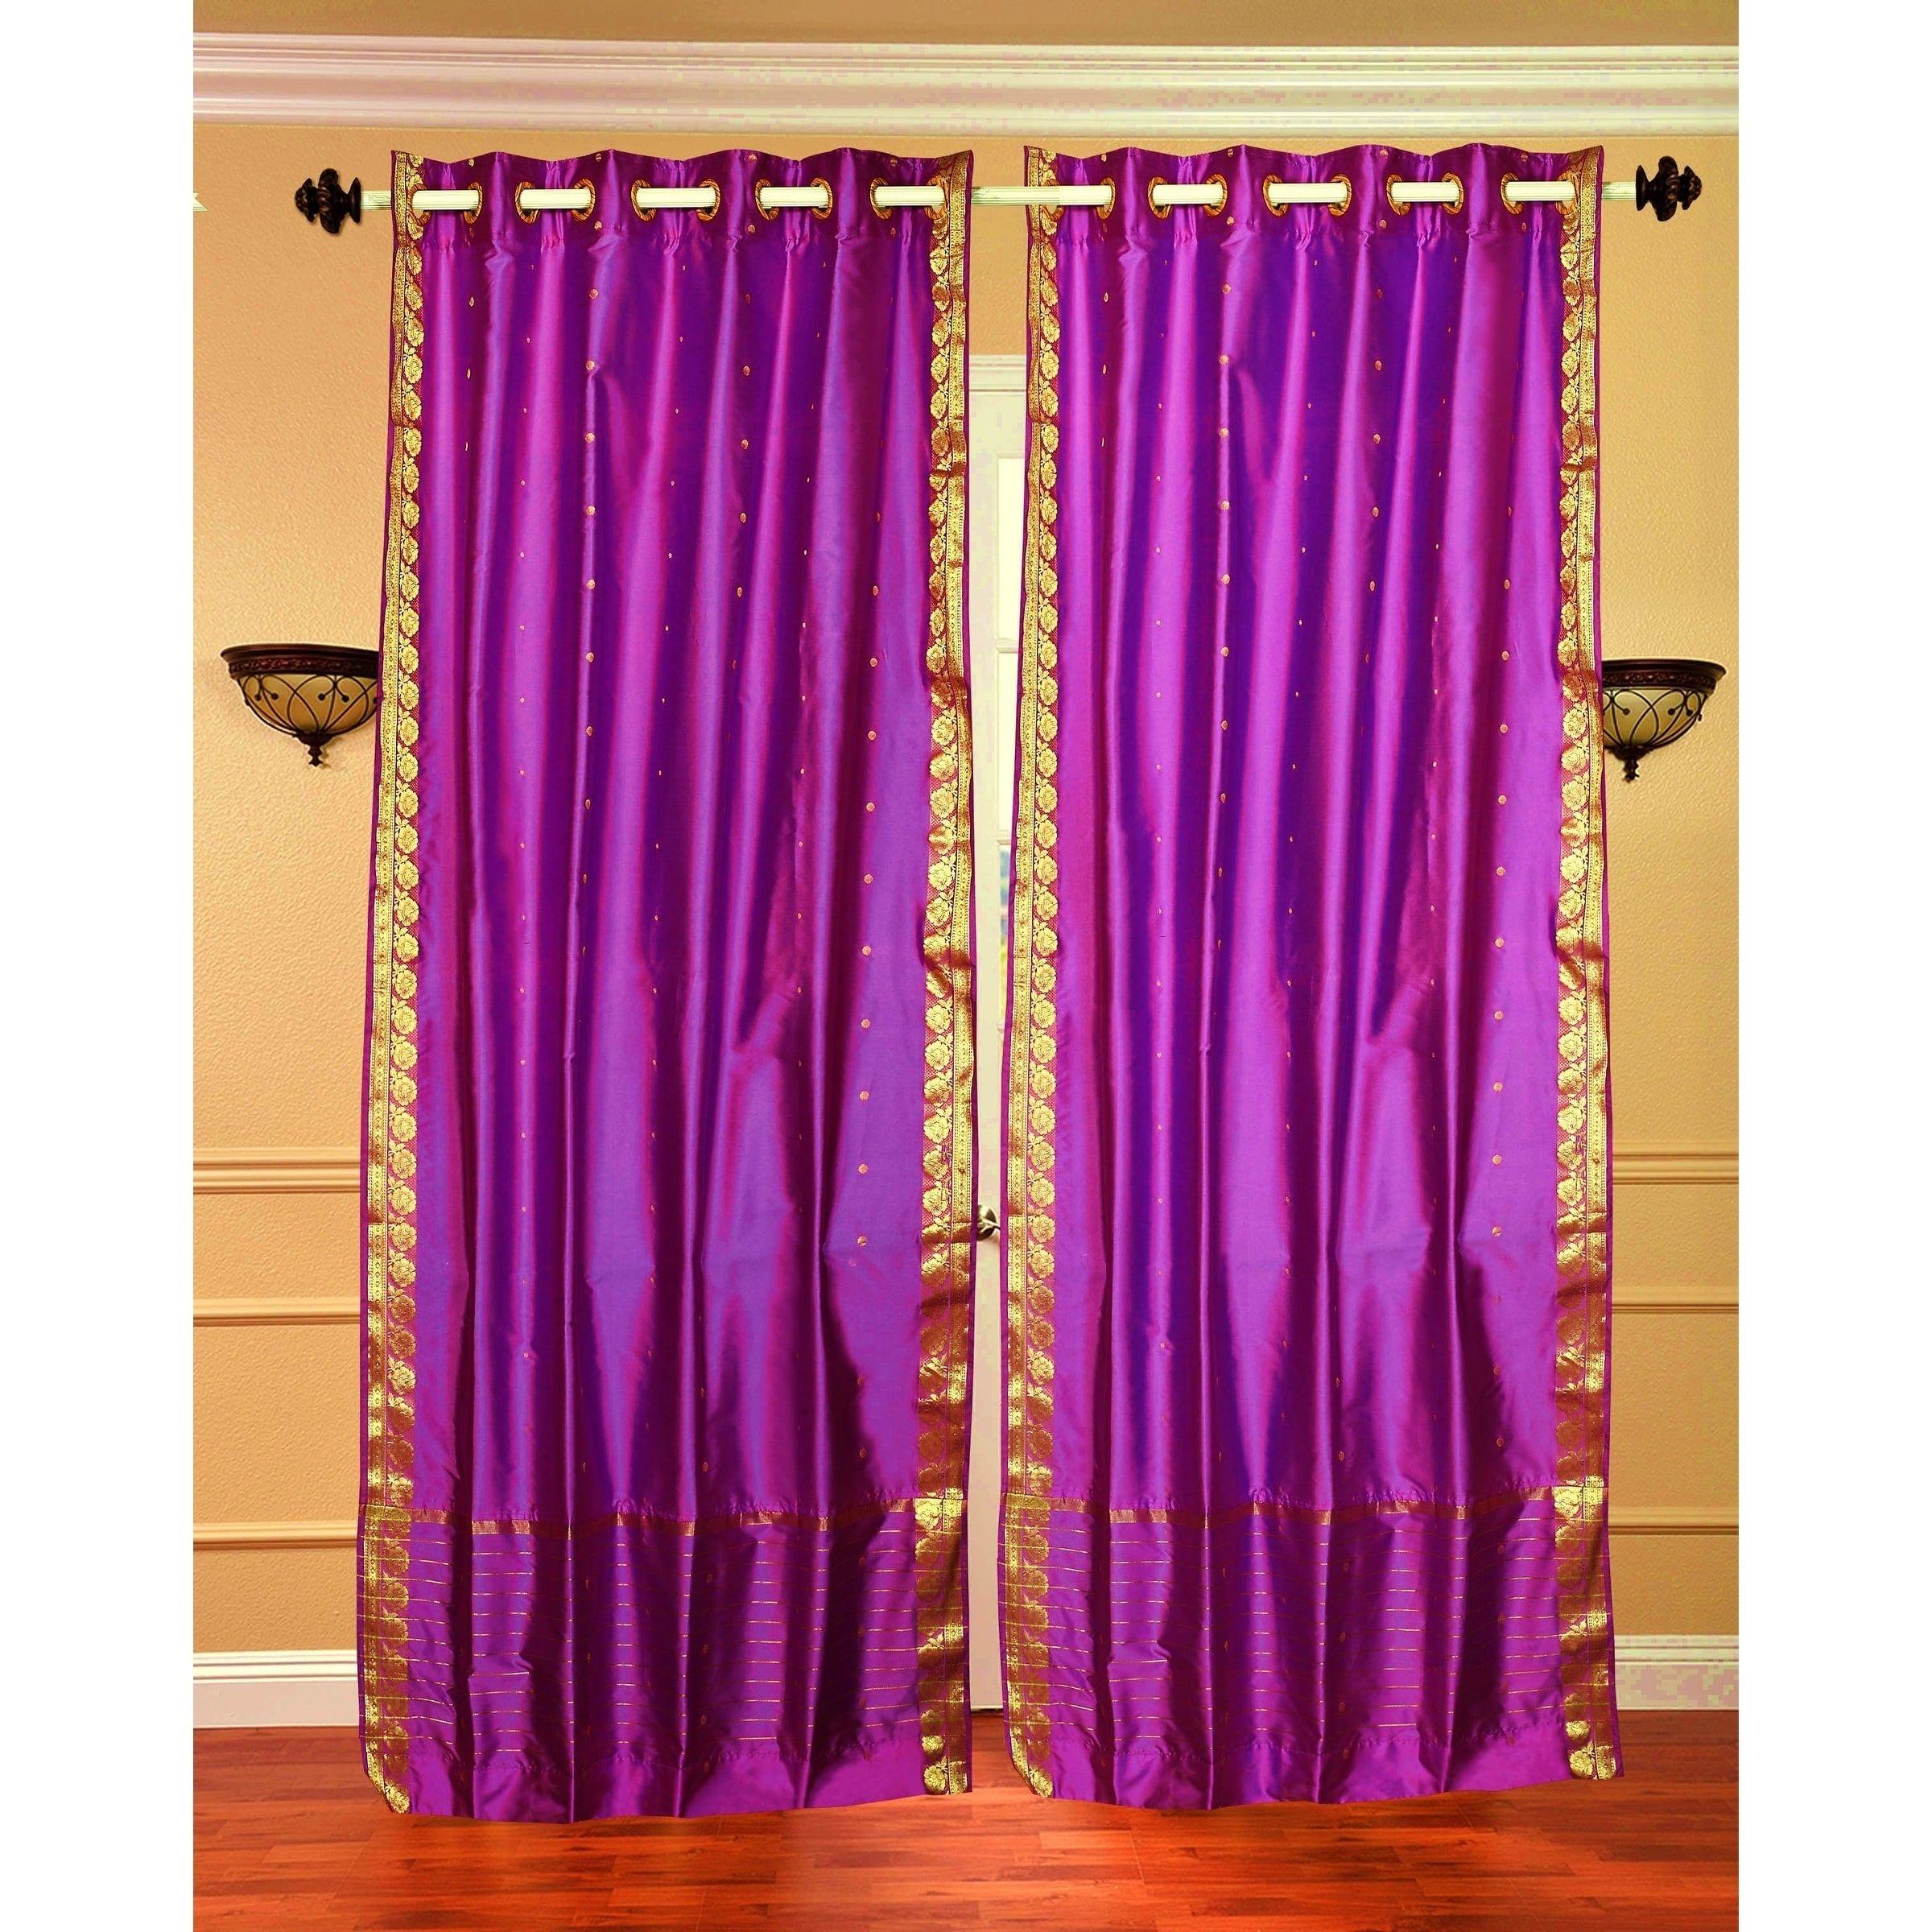 shower curtain leaves walmart purple interdesign drapes ip com curtains or